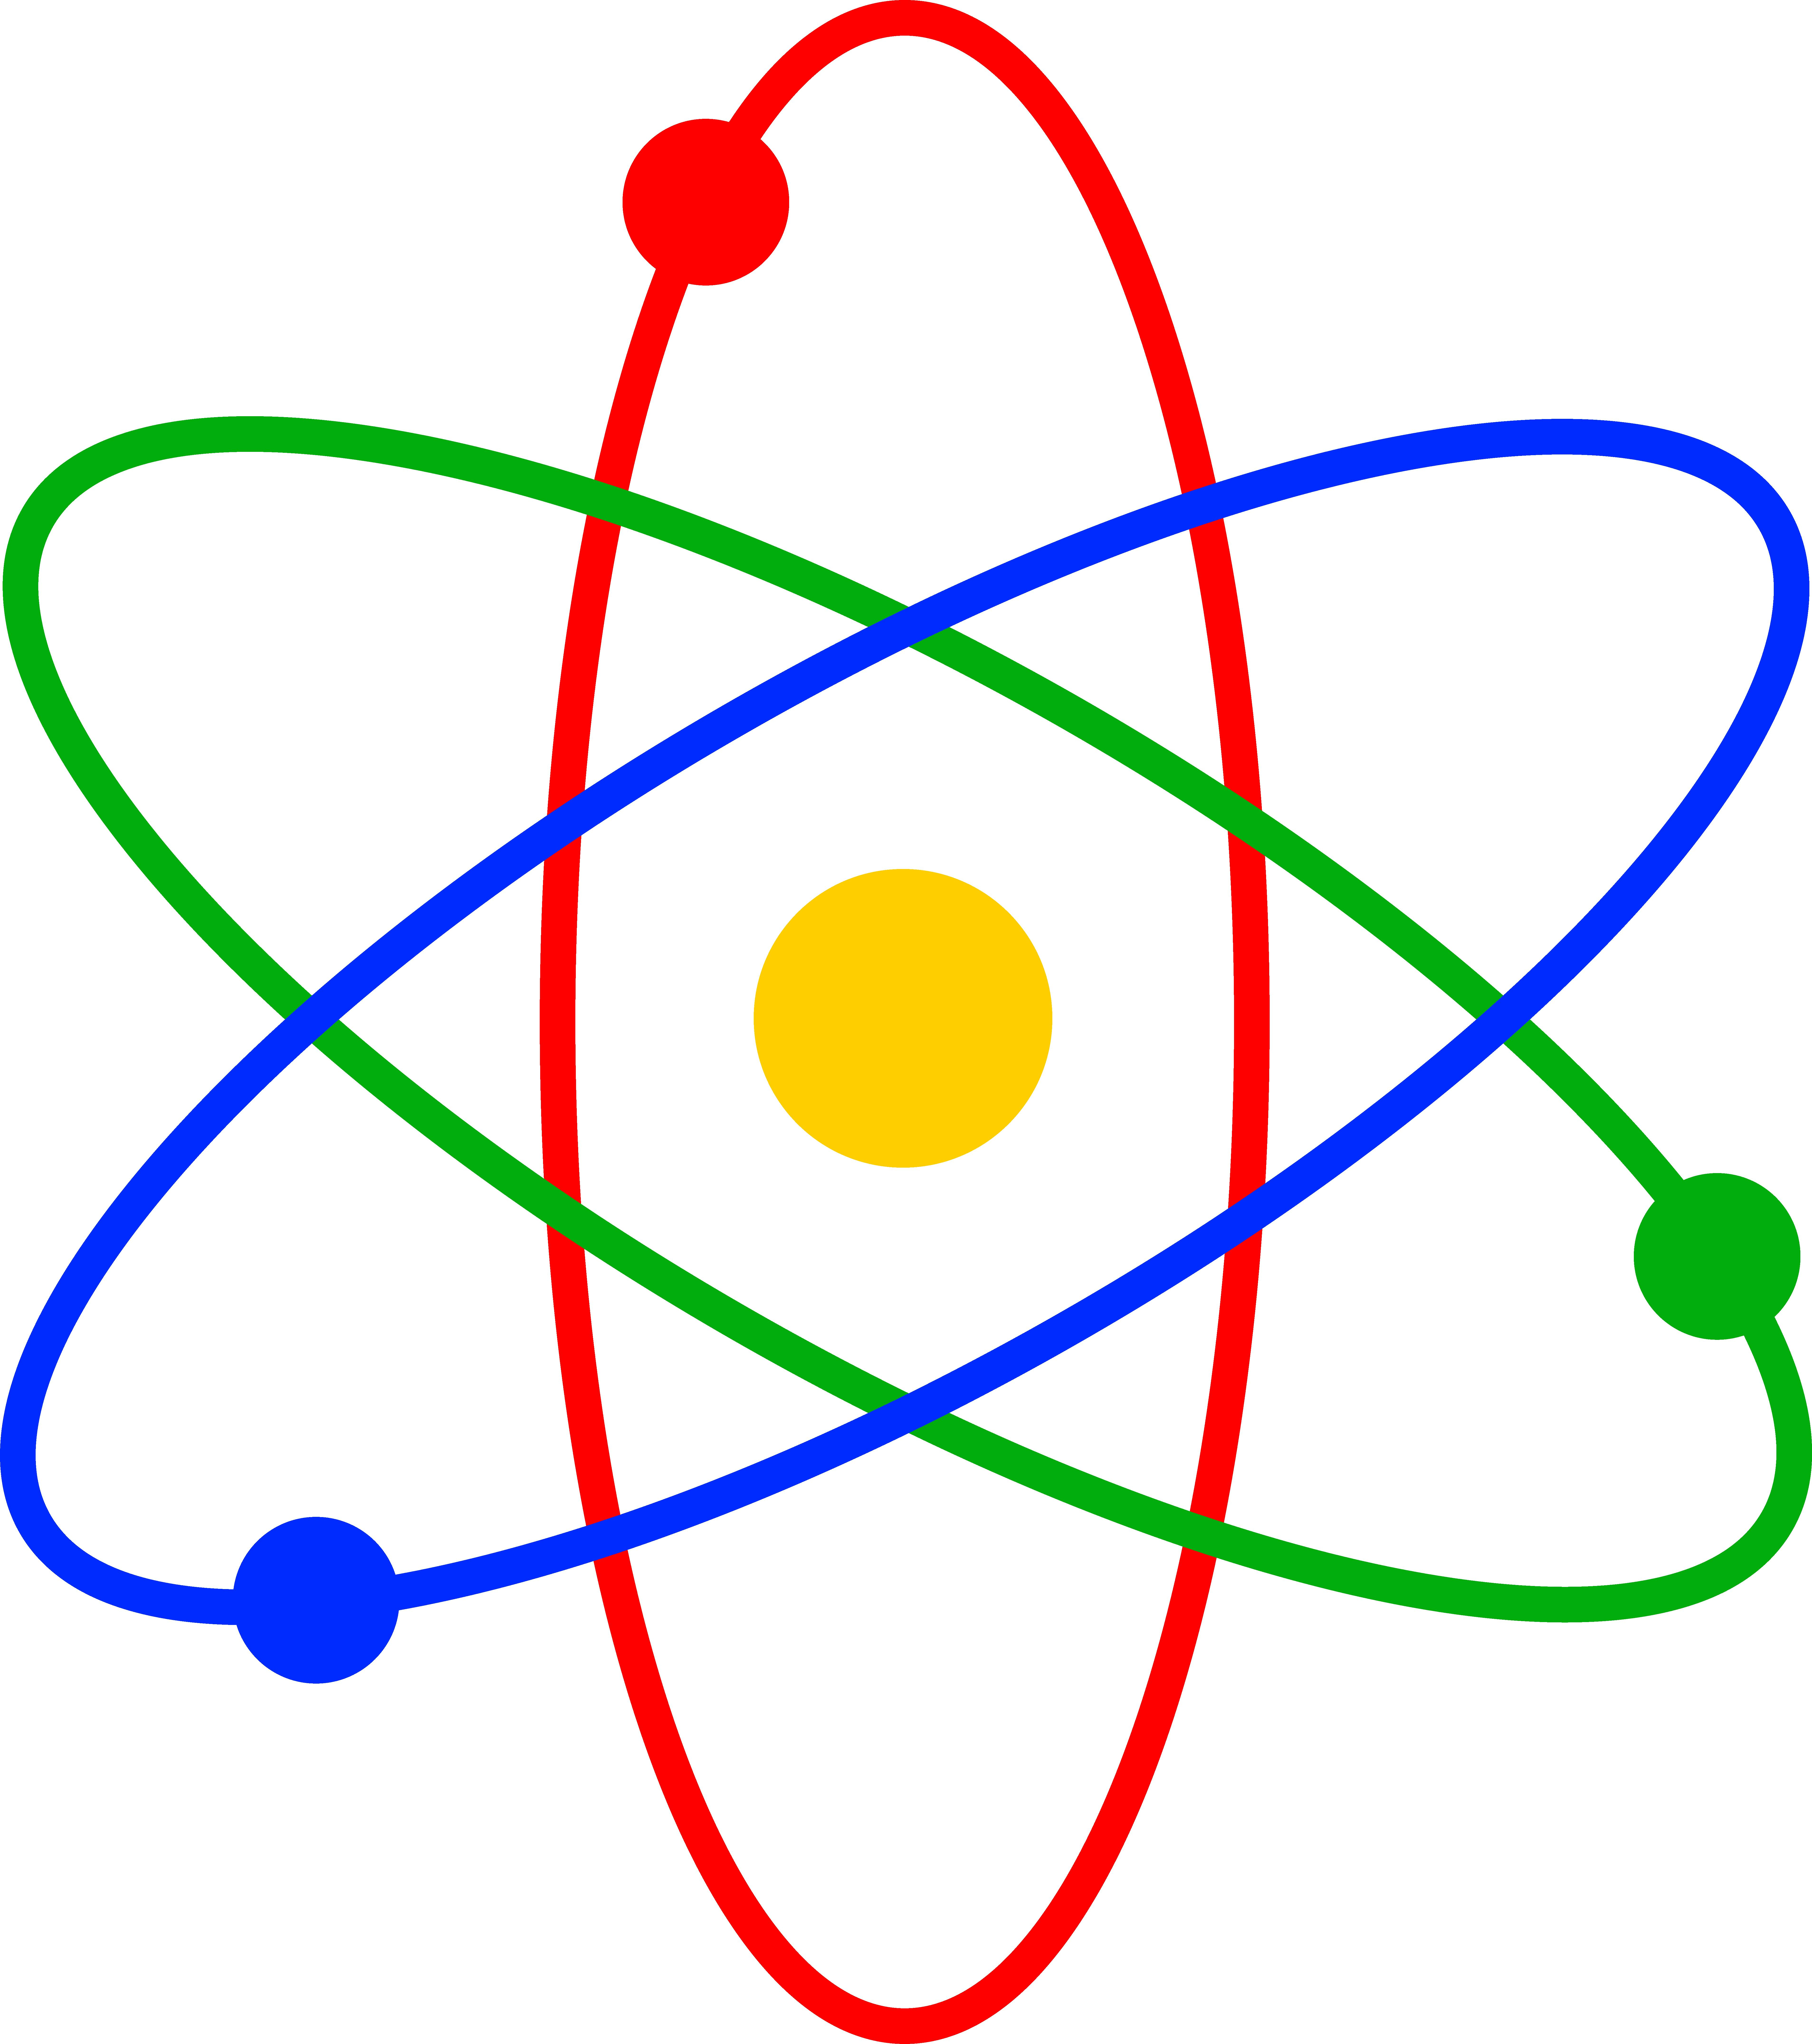 Atom Cliparts-Atom cliparts-6